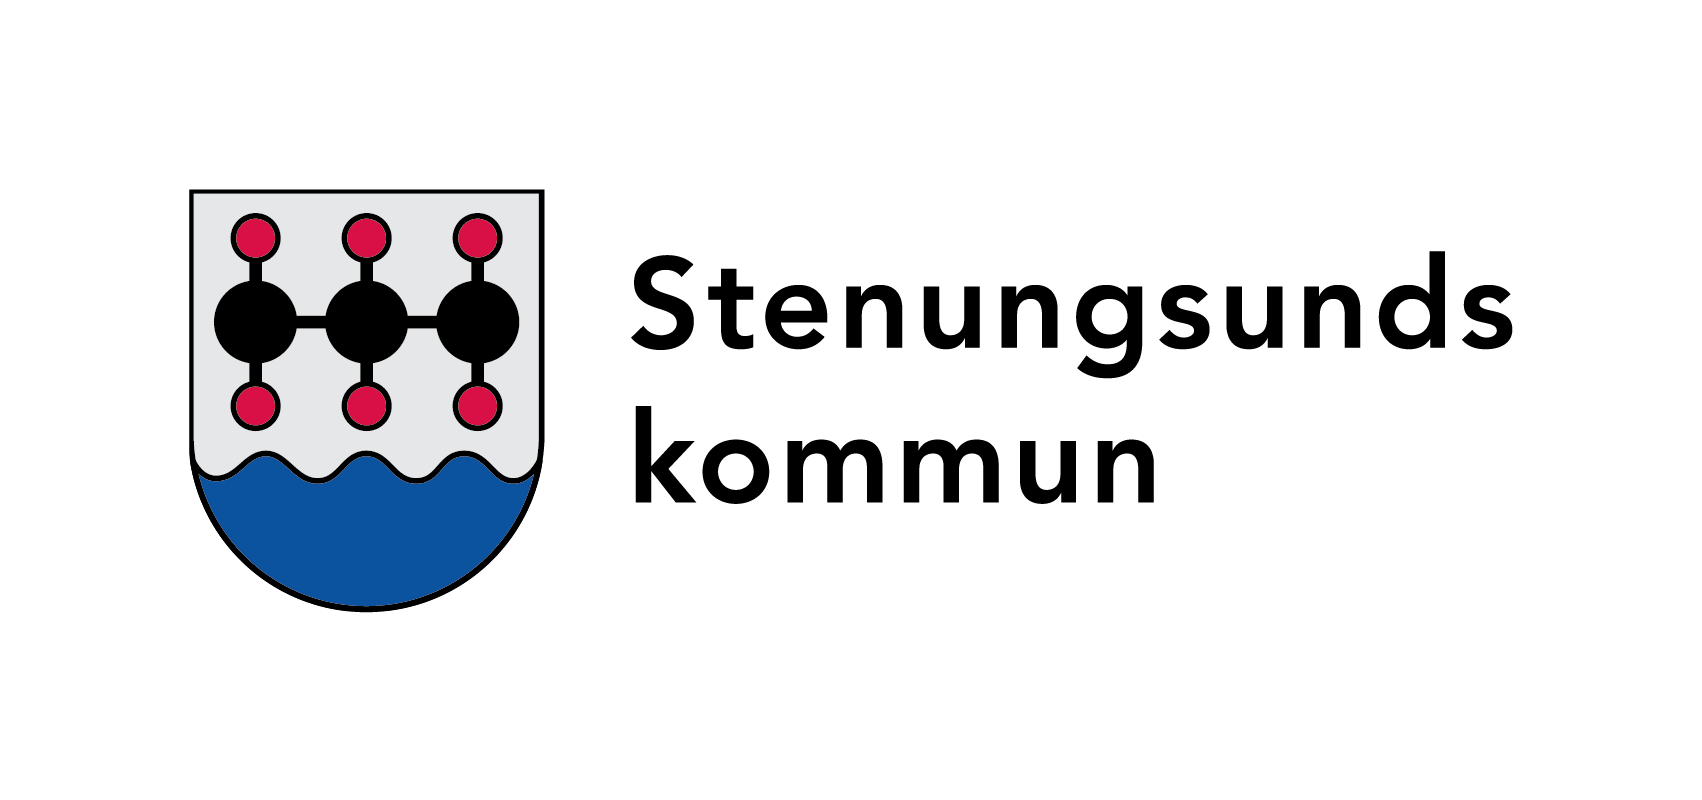 Stenungsund.png